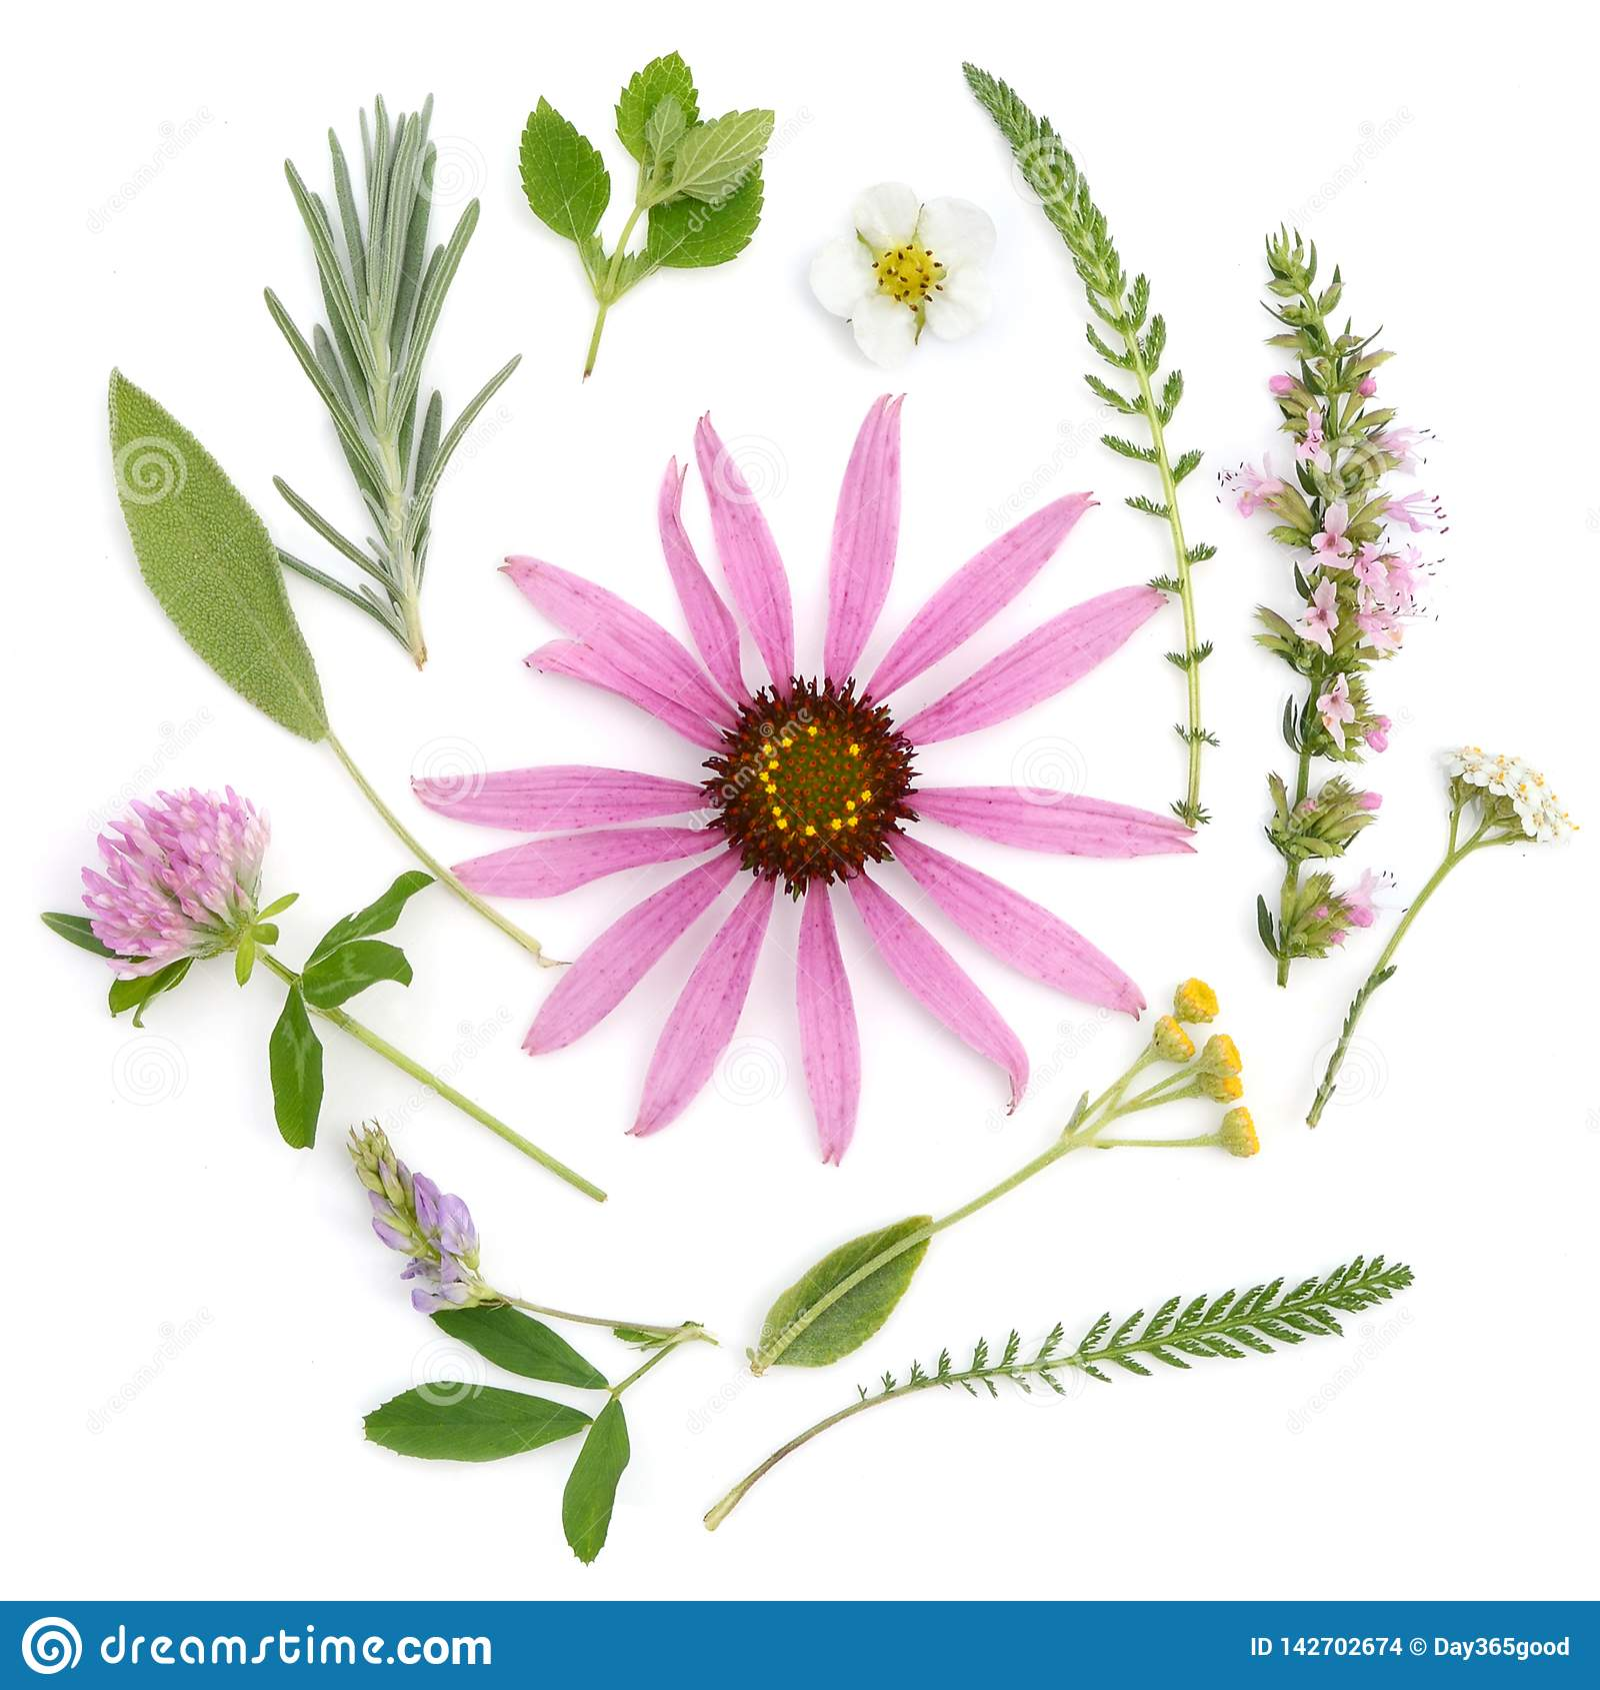 Helende Kruiden Geneeskrachtige installaties en bloemenboeket van echinacea, klaver, duizendblad, hyssop, salie, luzerne, lavende